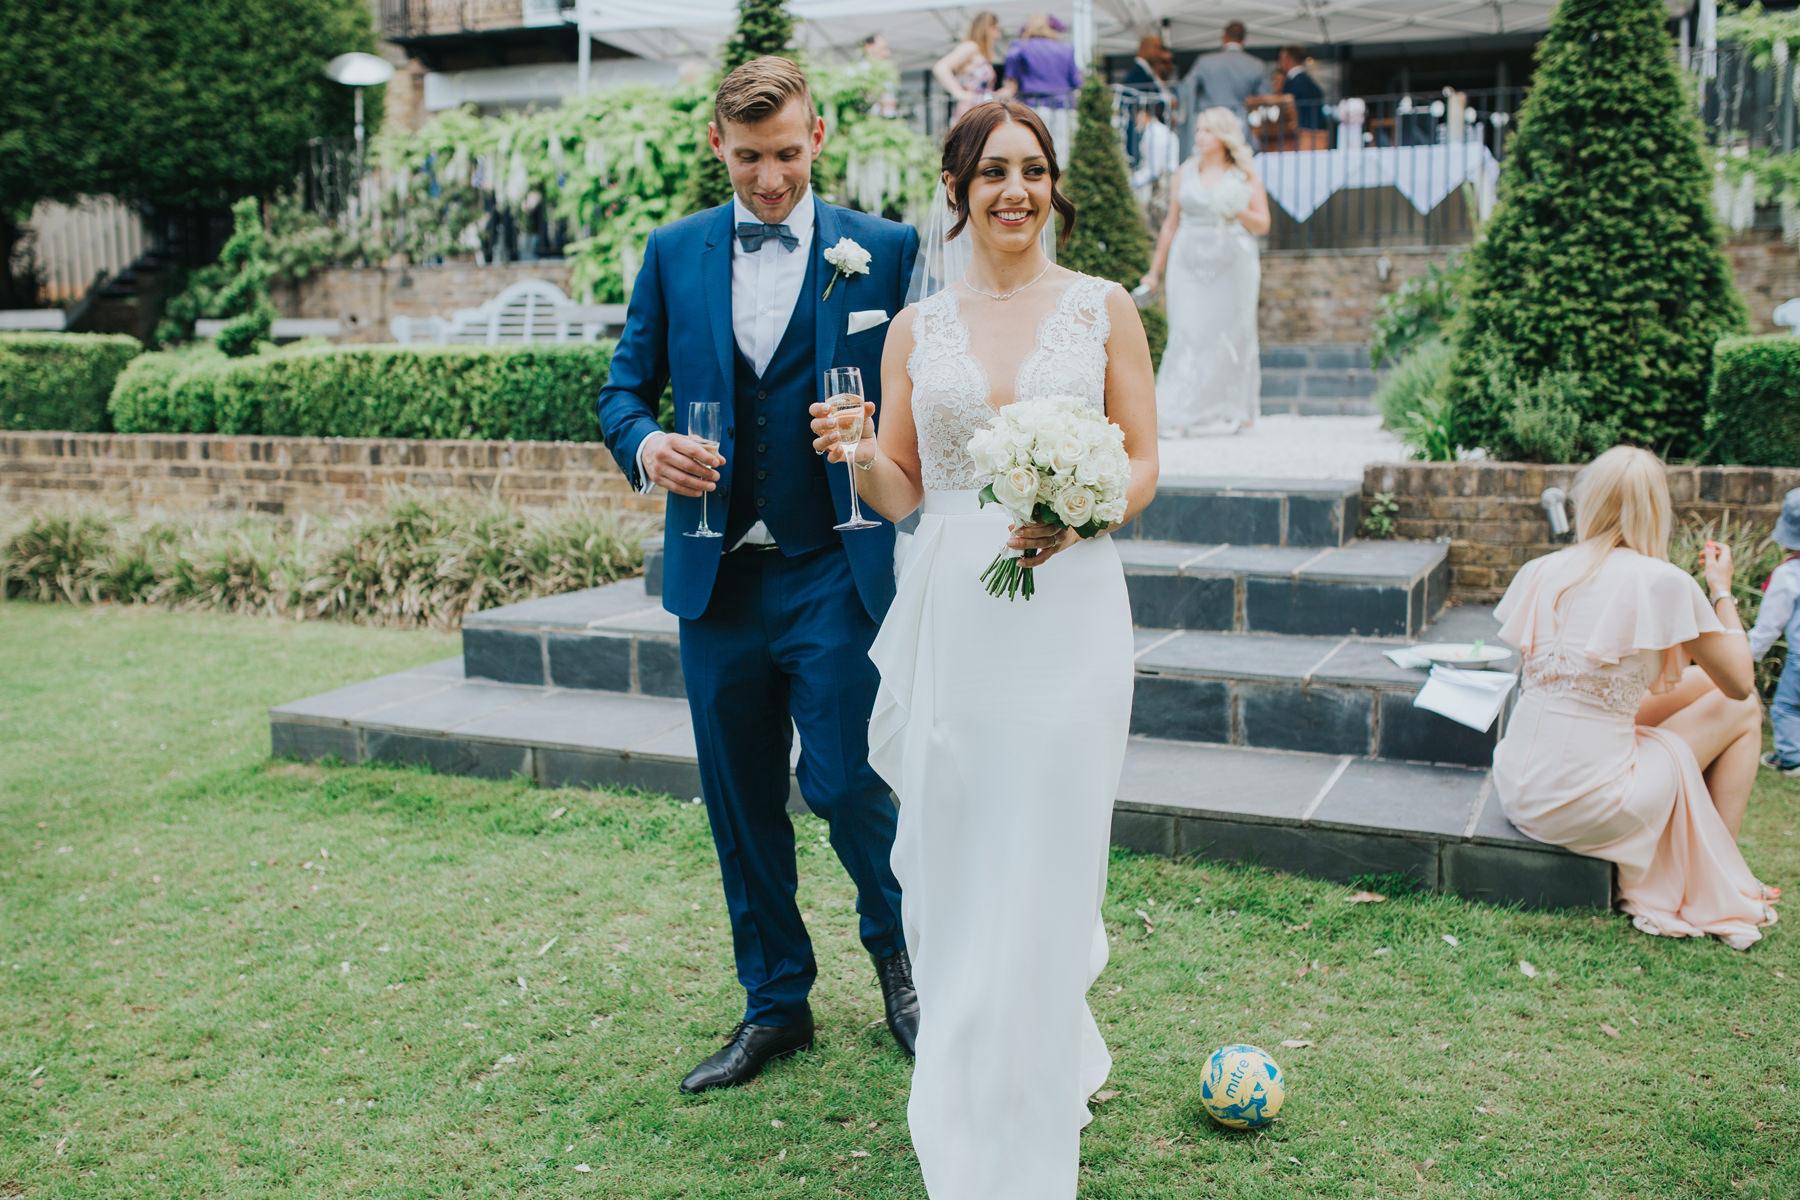 CRL-308-The Bingham wedding Richmond-Claire Rob bridal couple portraits.jpg